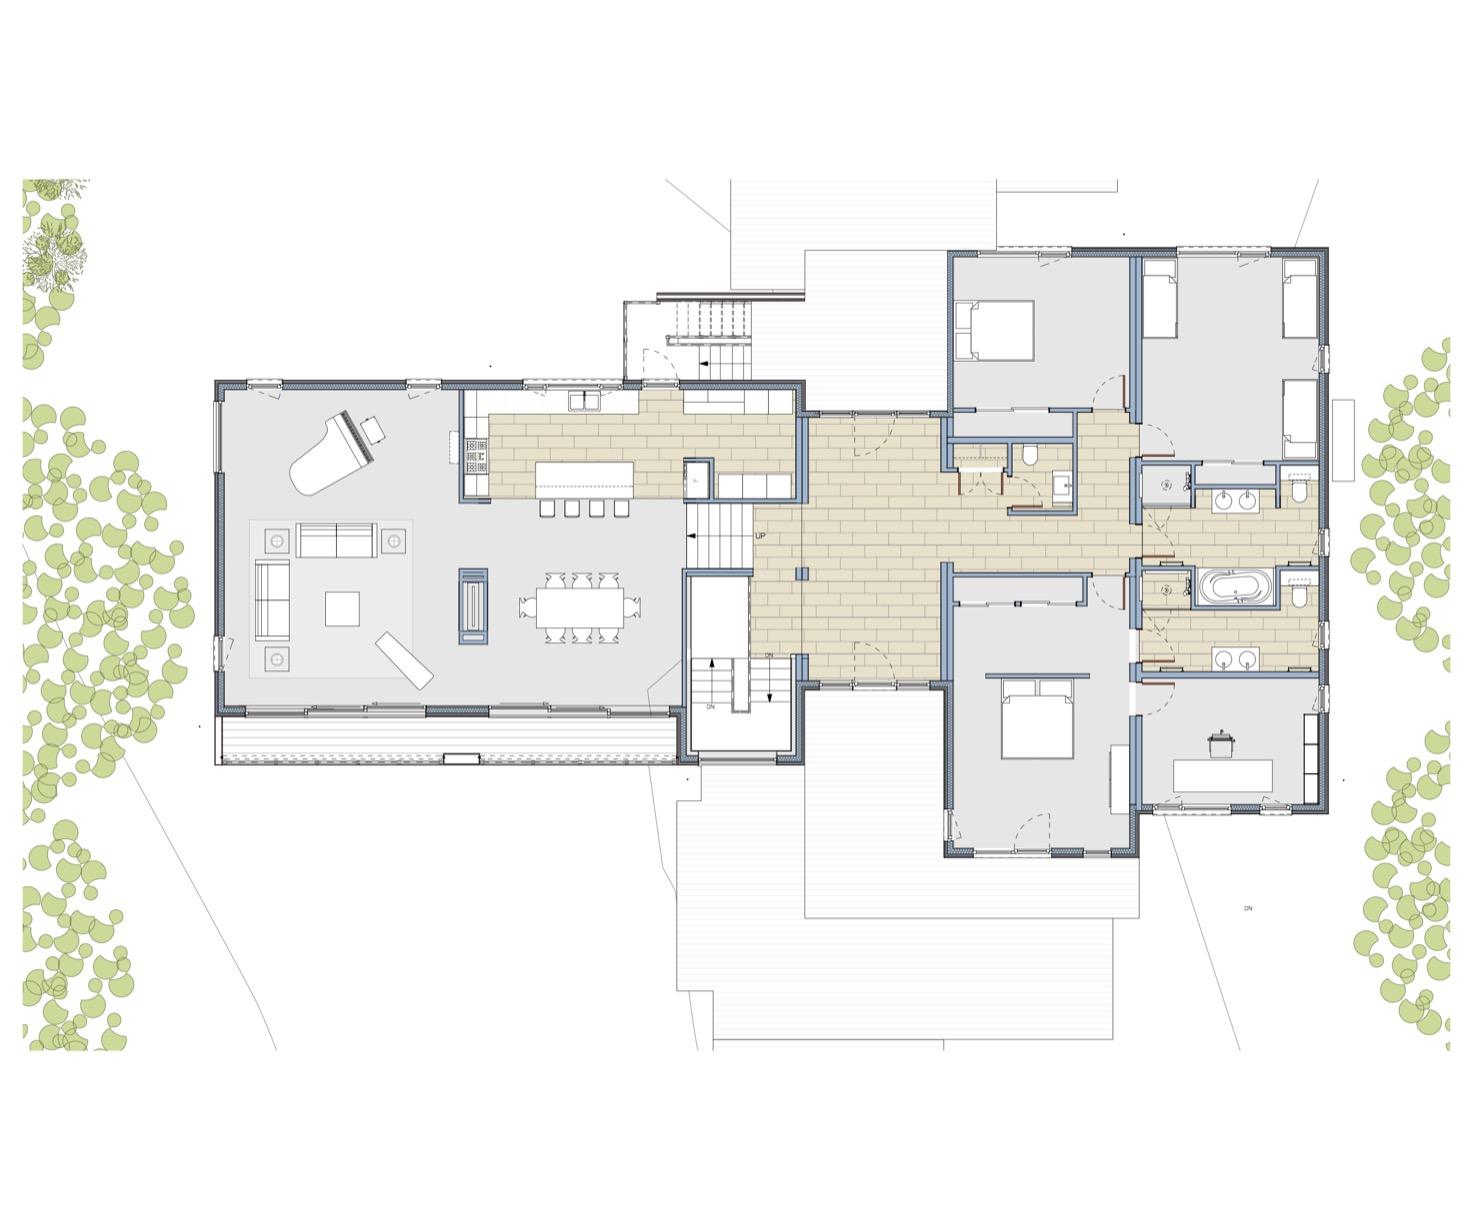 cld-main-floor-1473.jpg